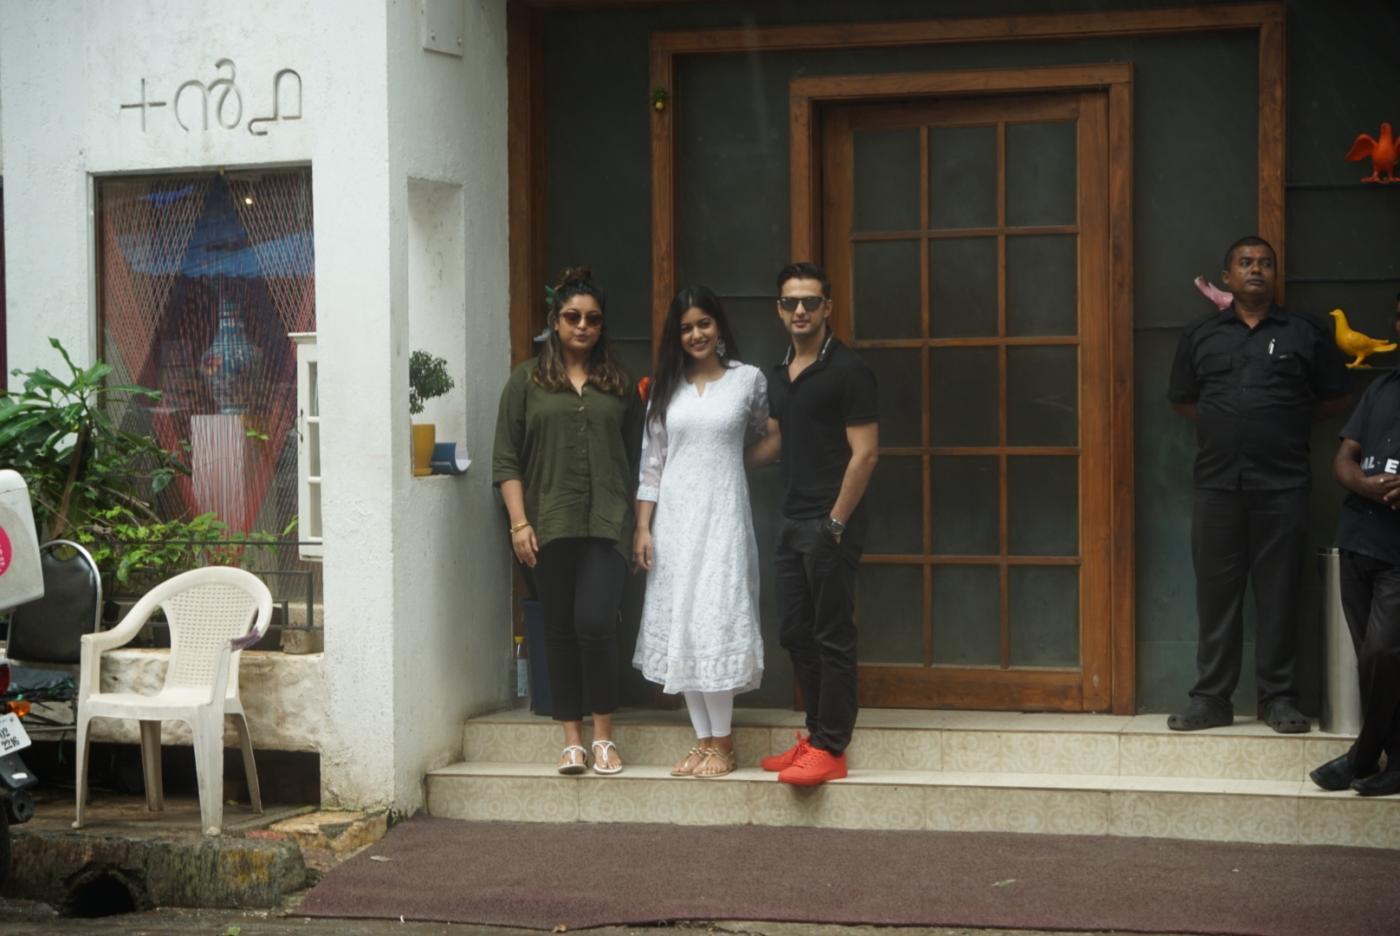 Mumbai: Actors Vatsal Sheth, Ishita Dutta and Tanushree Dutta seen at Mumbai's Juhu on Aug 5, 2018. (Photo: IANS) by .